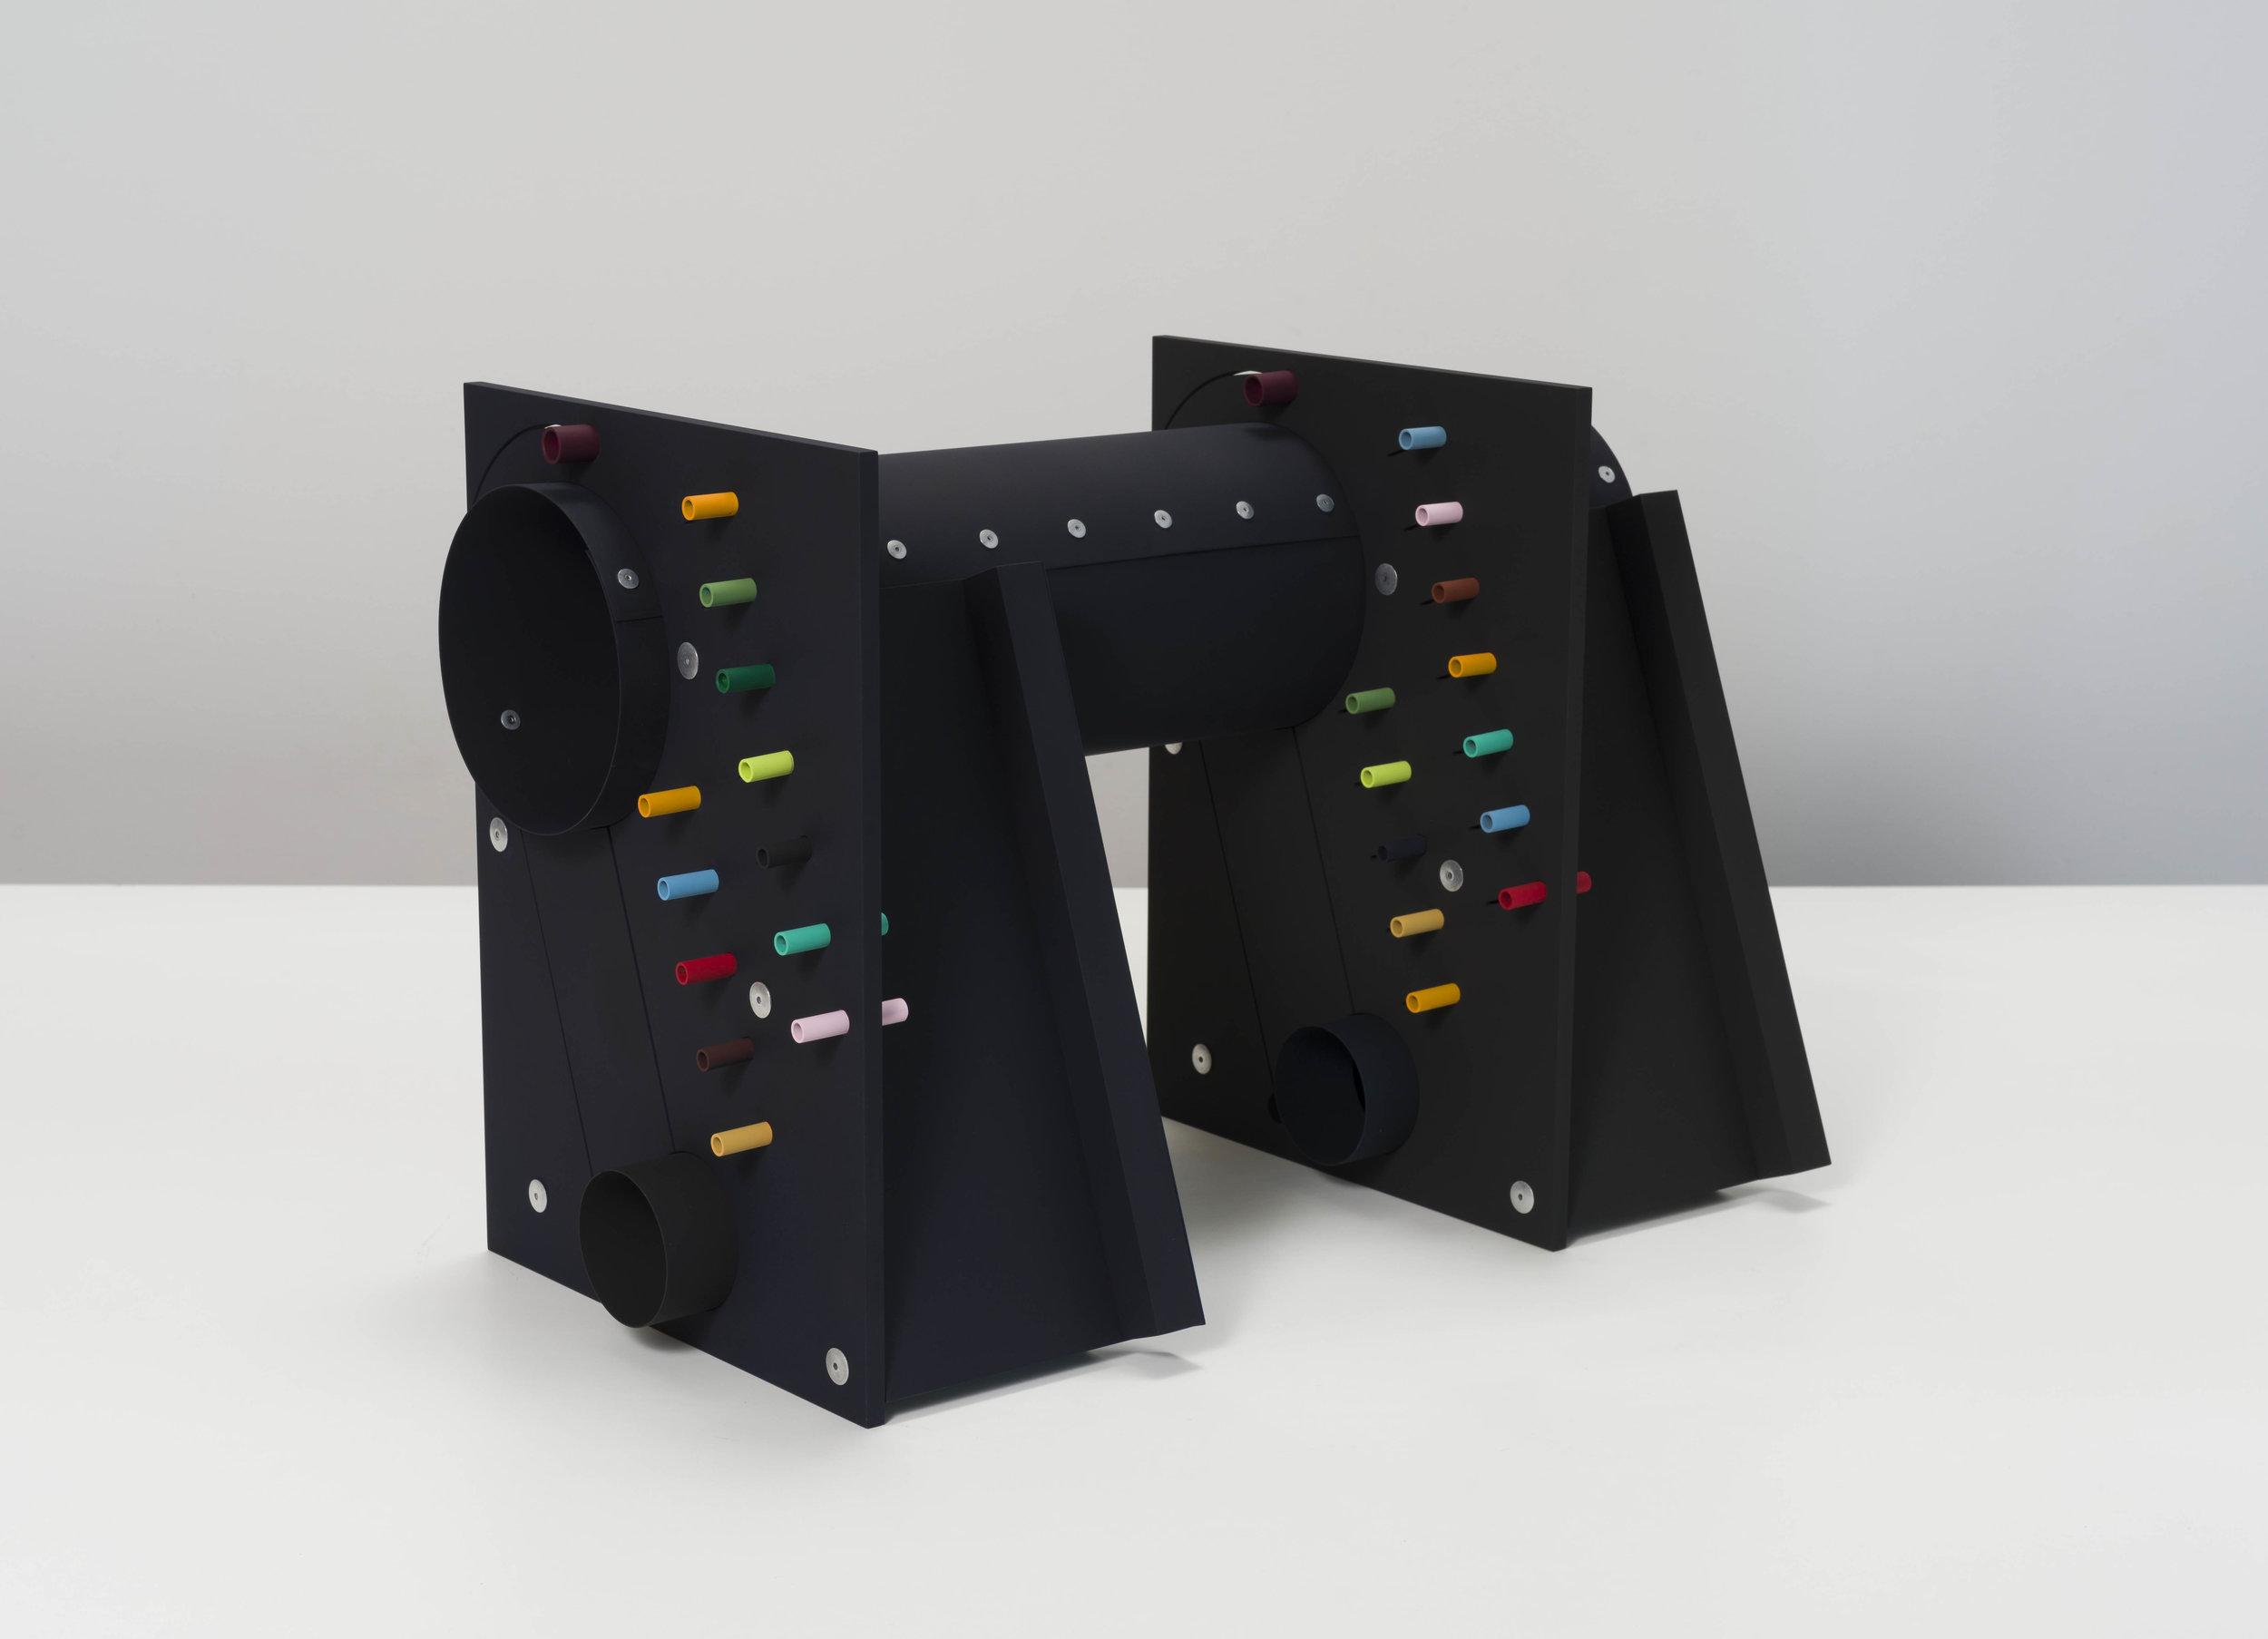 Matt Paweski,  Switch - Switch , 2018, aluminum, aluminum rivets, vinyl paint, 18 × 24 × 12 inches (45.7 × 60.9 × 30.5 cm)